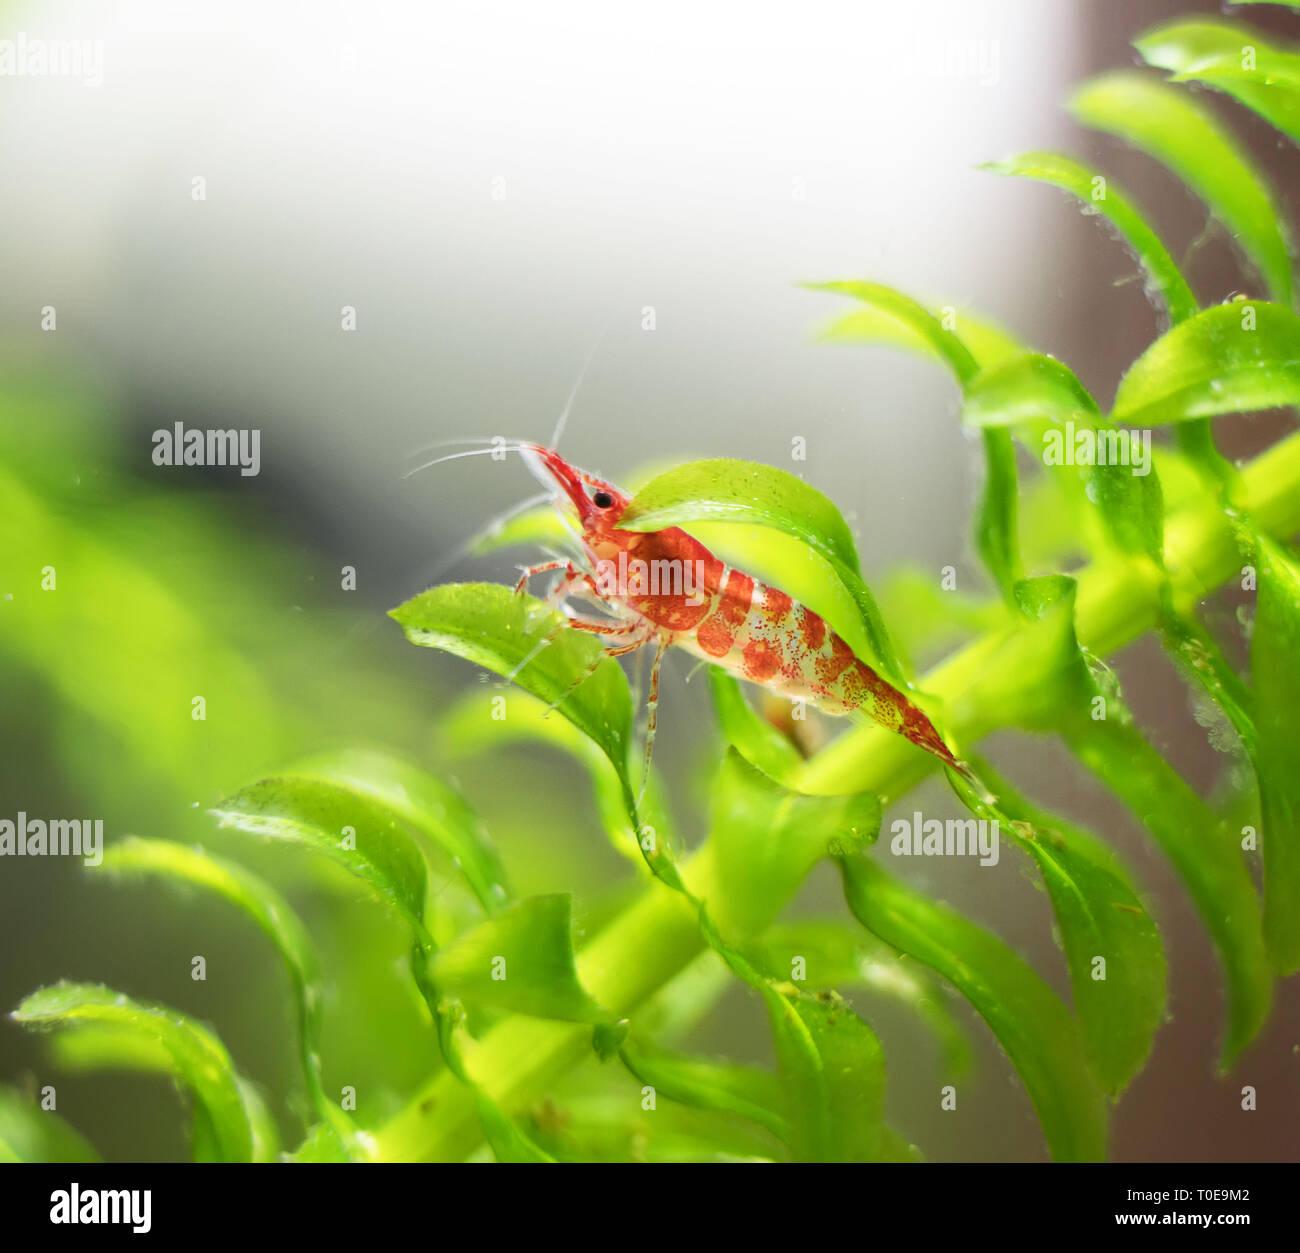 Freshwater shrimp in freshwater aquarium  Neocaridina davidi